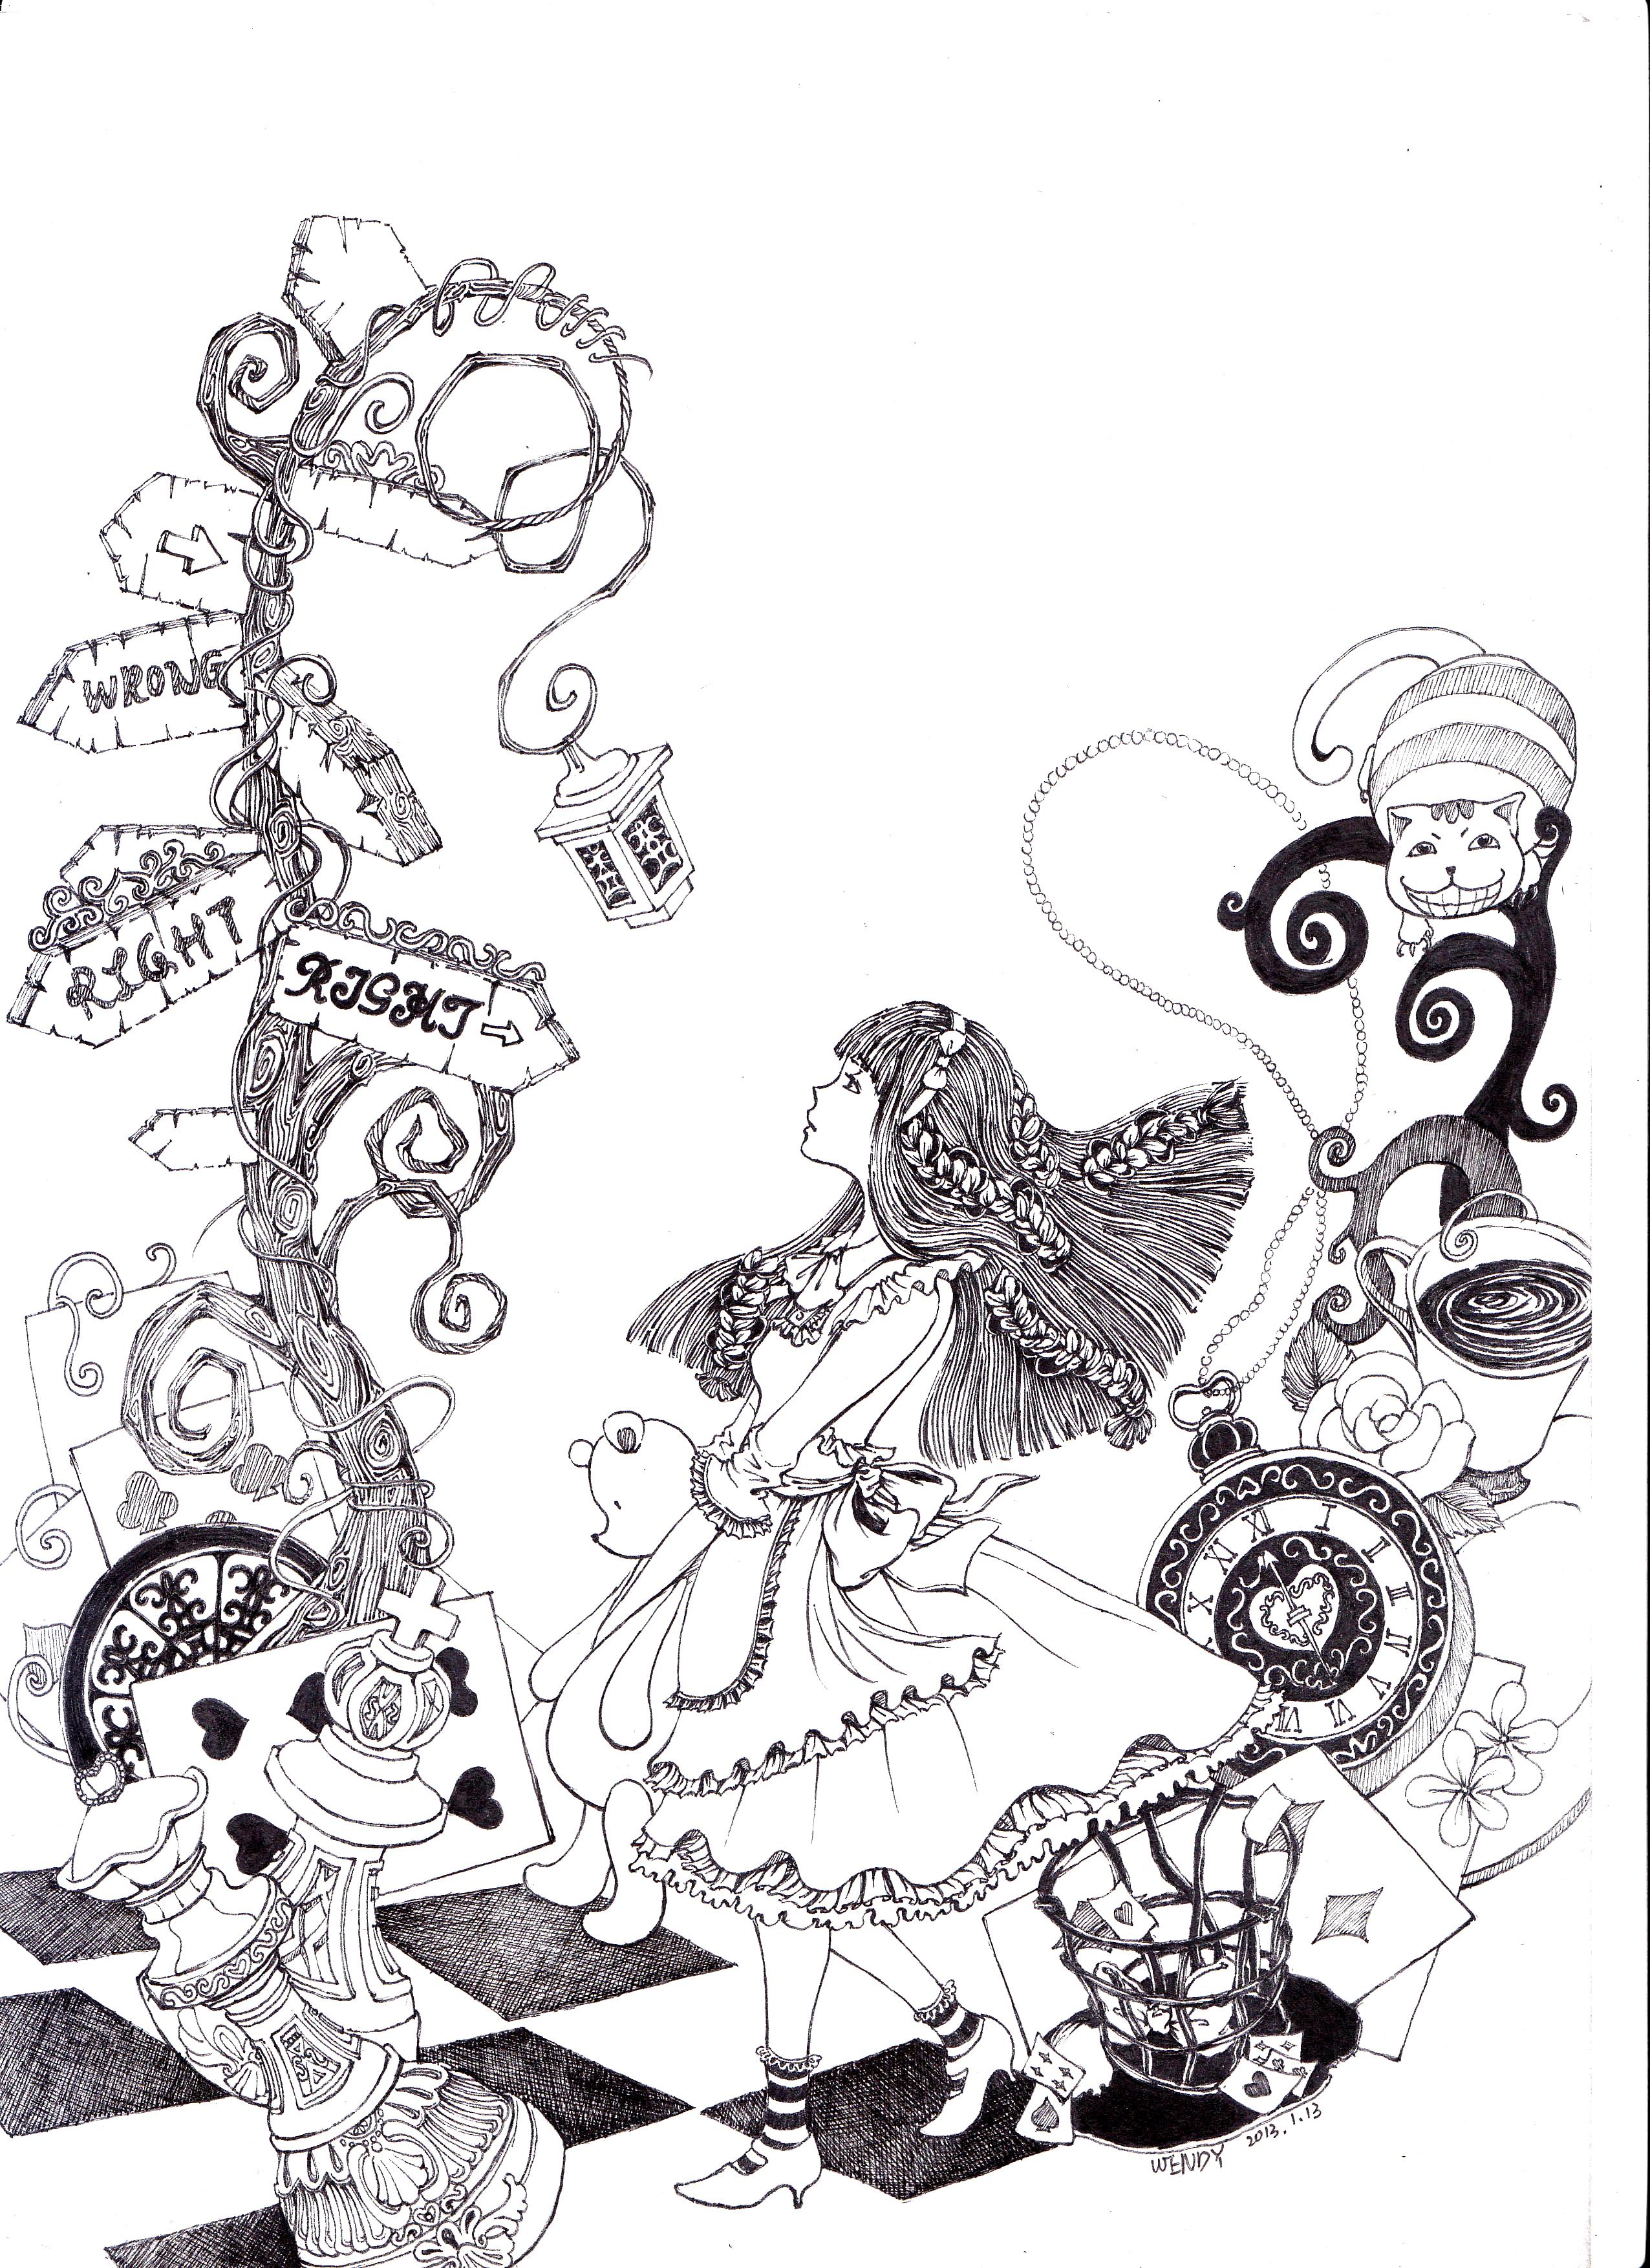 alice 想象随笔|插画|插画习作|wendy_x - 原创作品